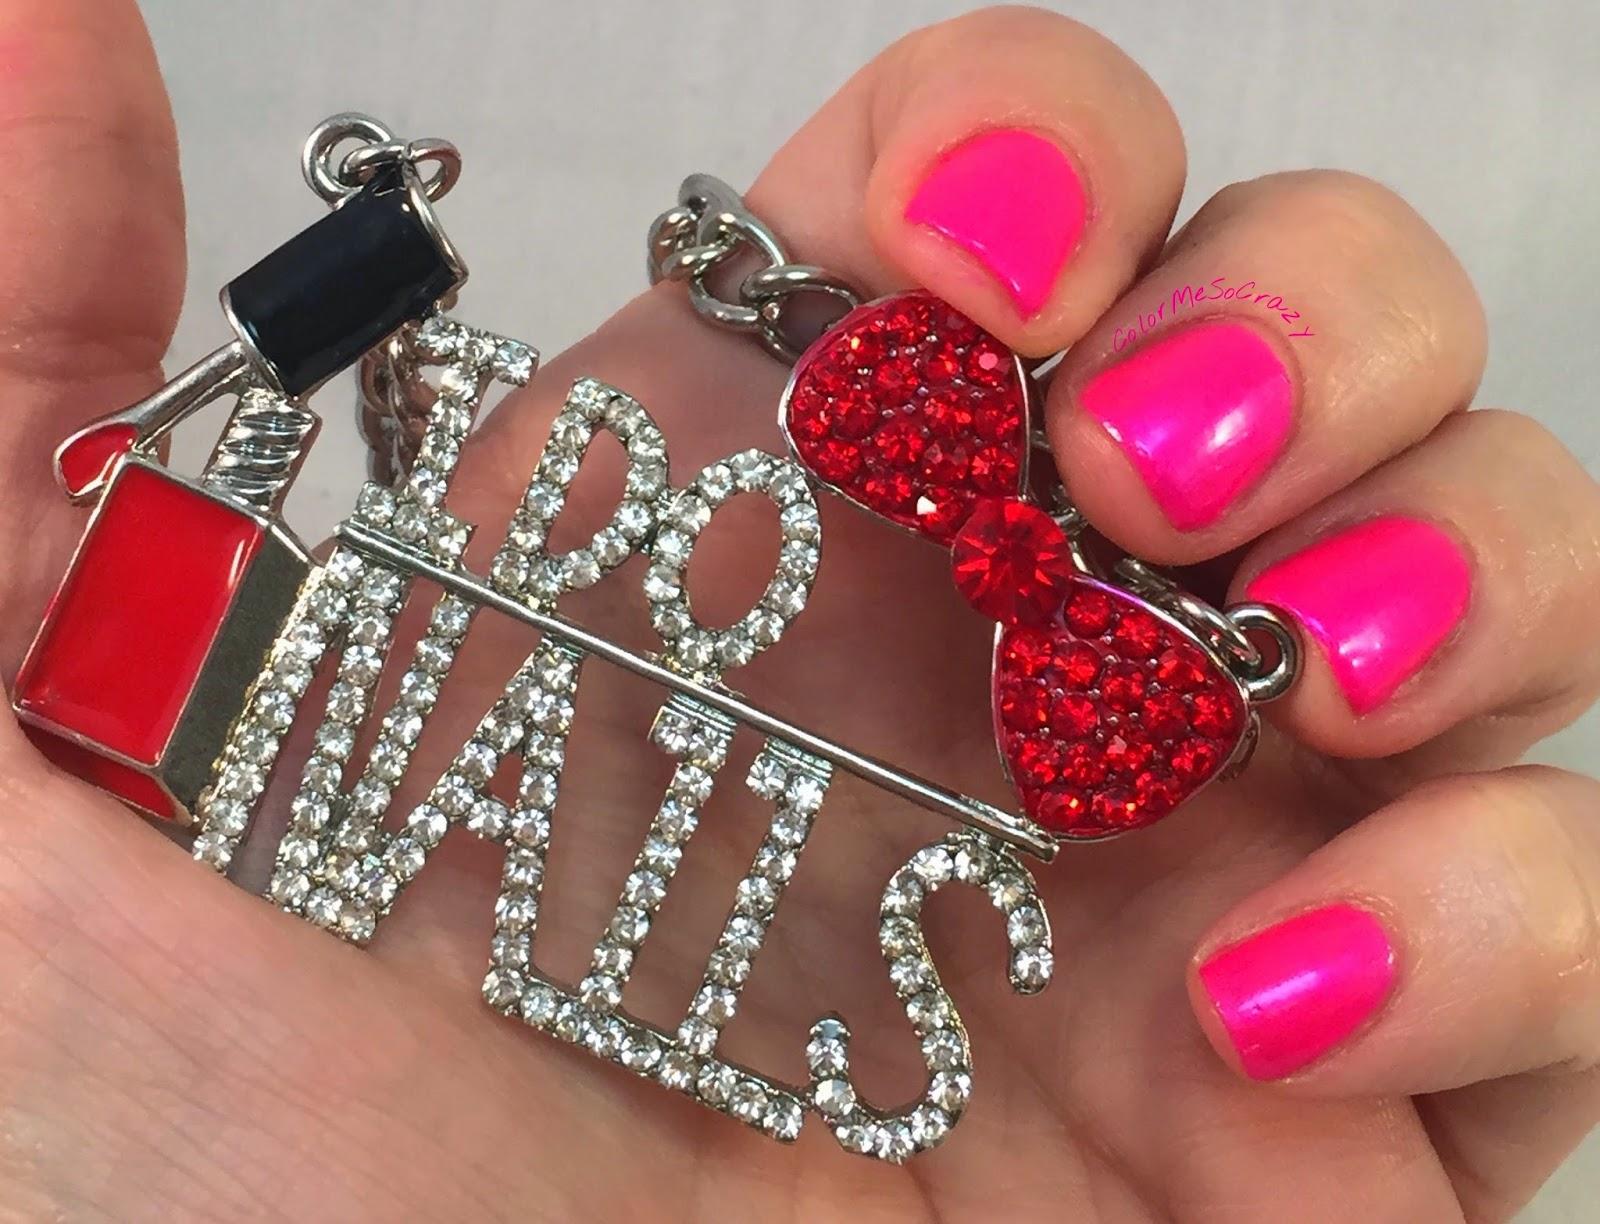 clubbing-girl-nail-polish, nail-polish-jewelry, necklace